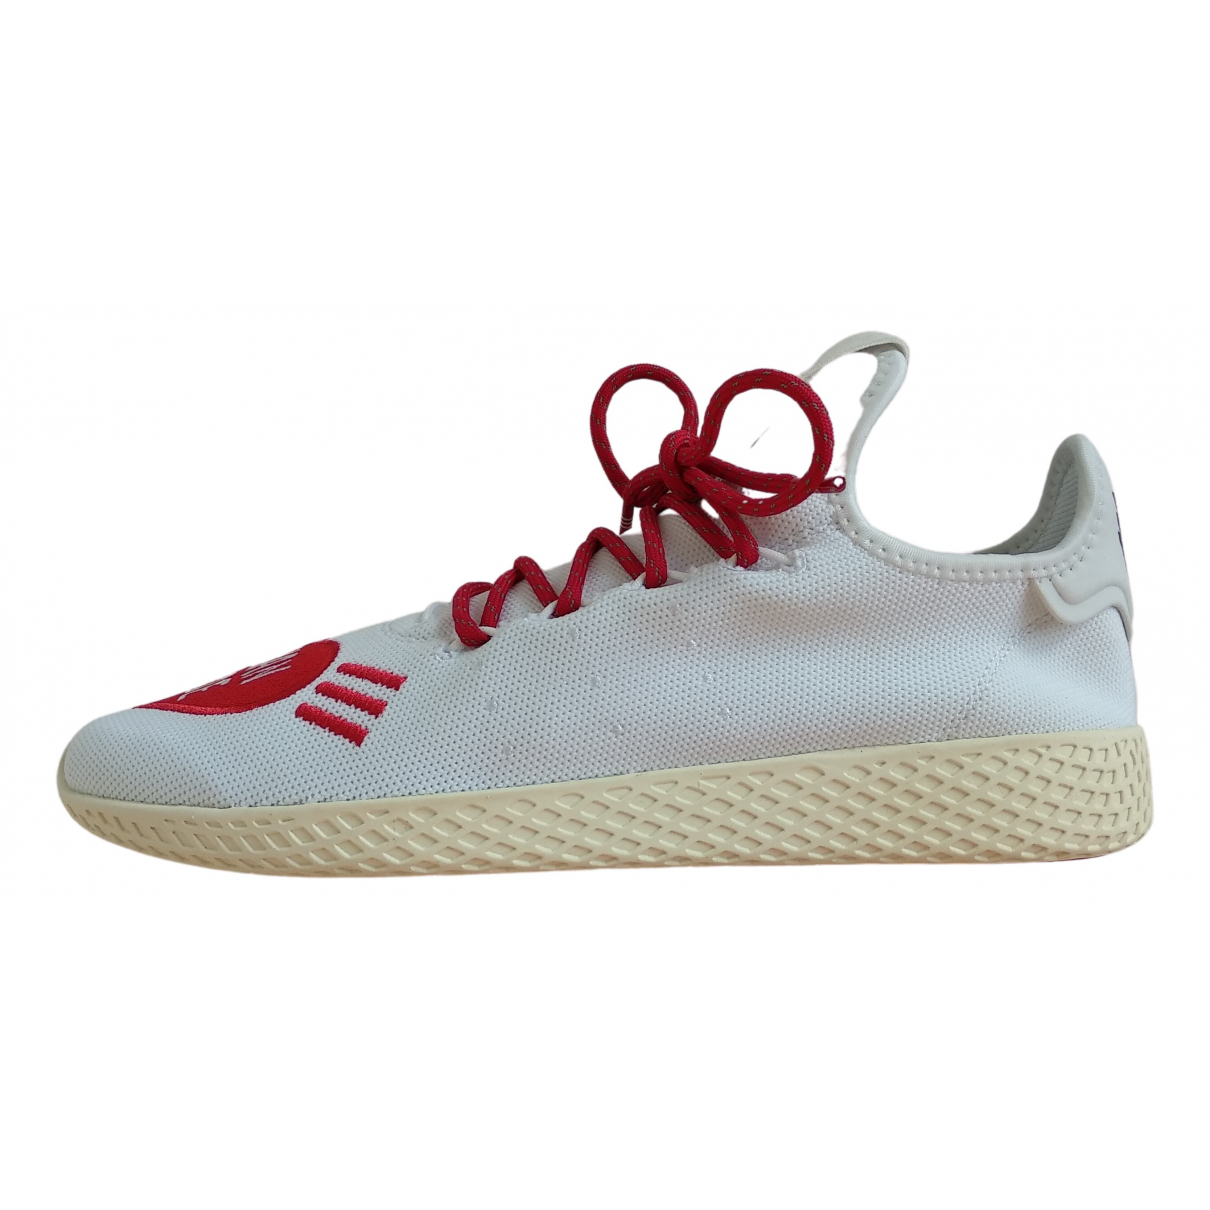 Adidas X Pharrell Williams \N Sneakers in  Weiss Leinen